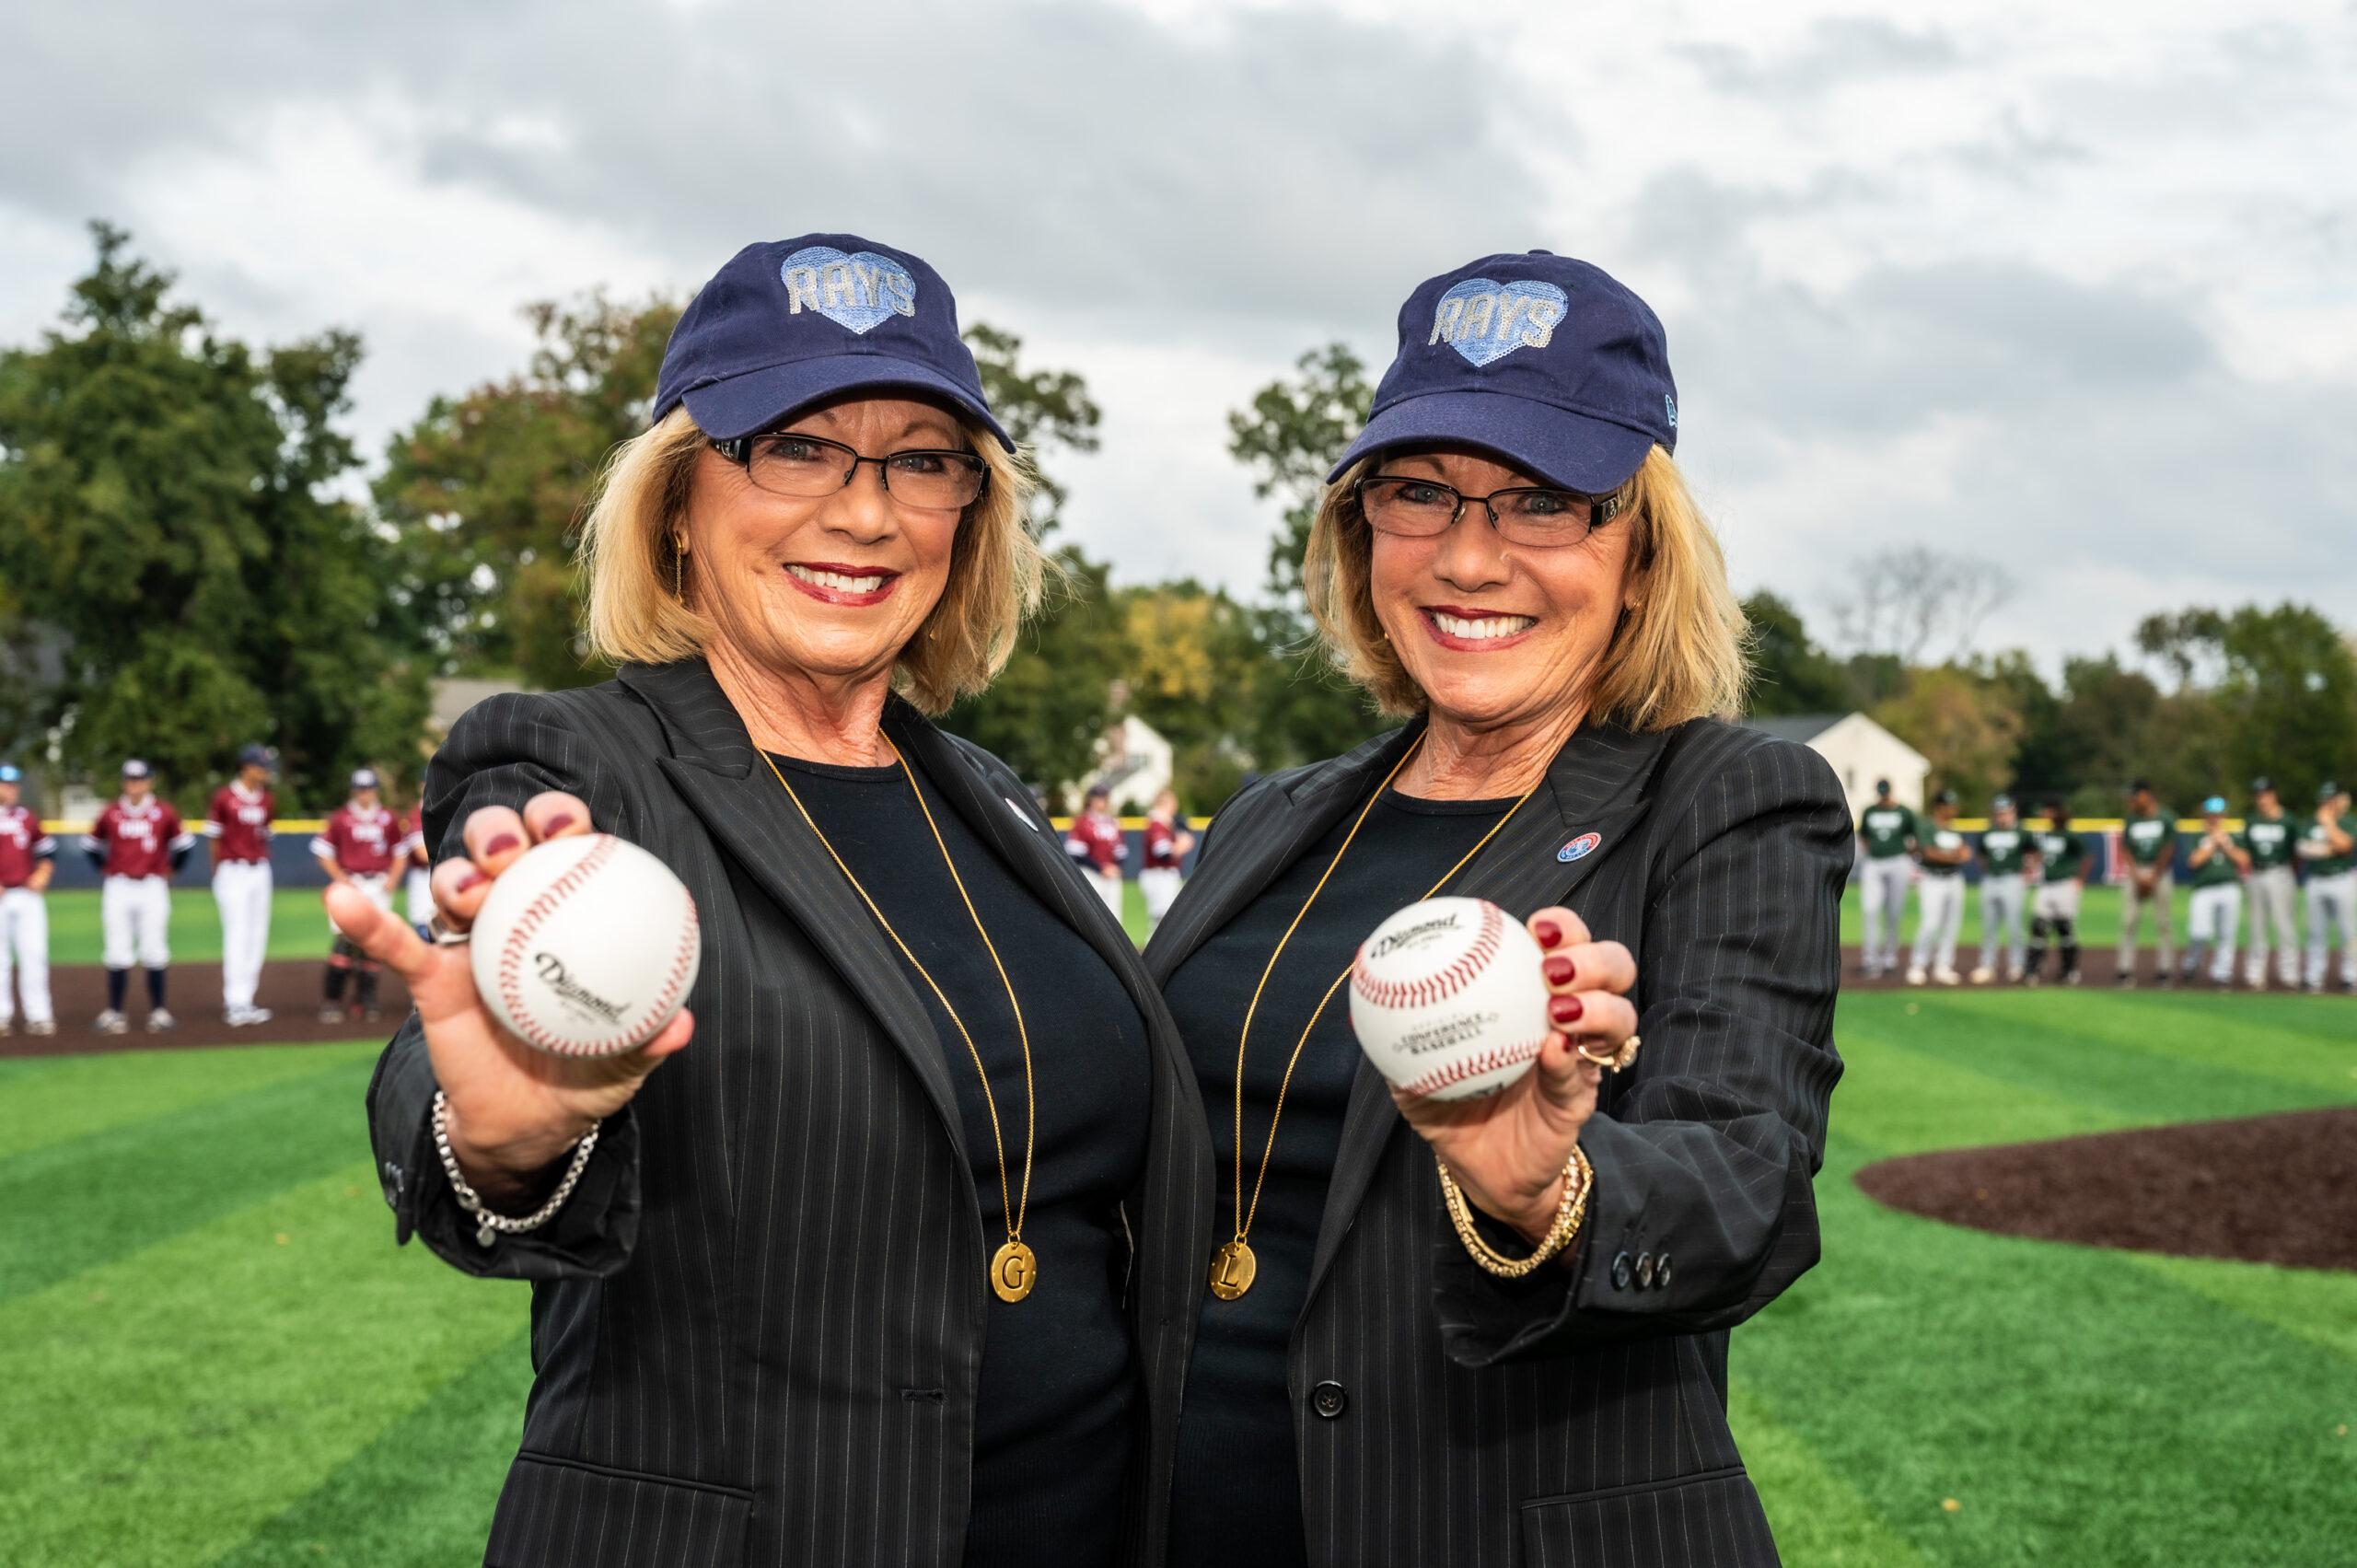 Two women hold baseballs.